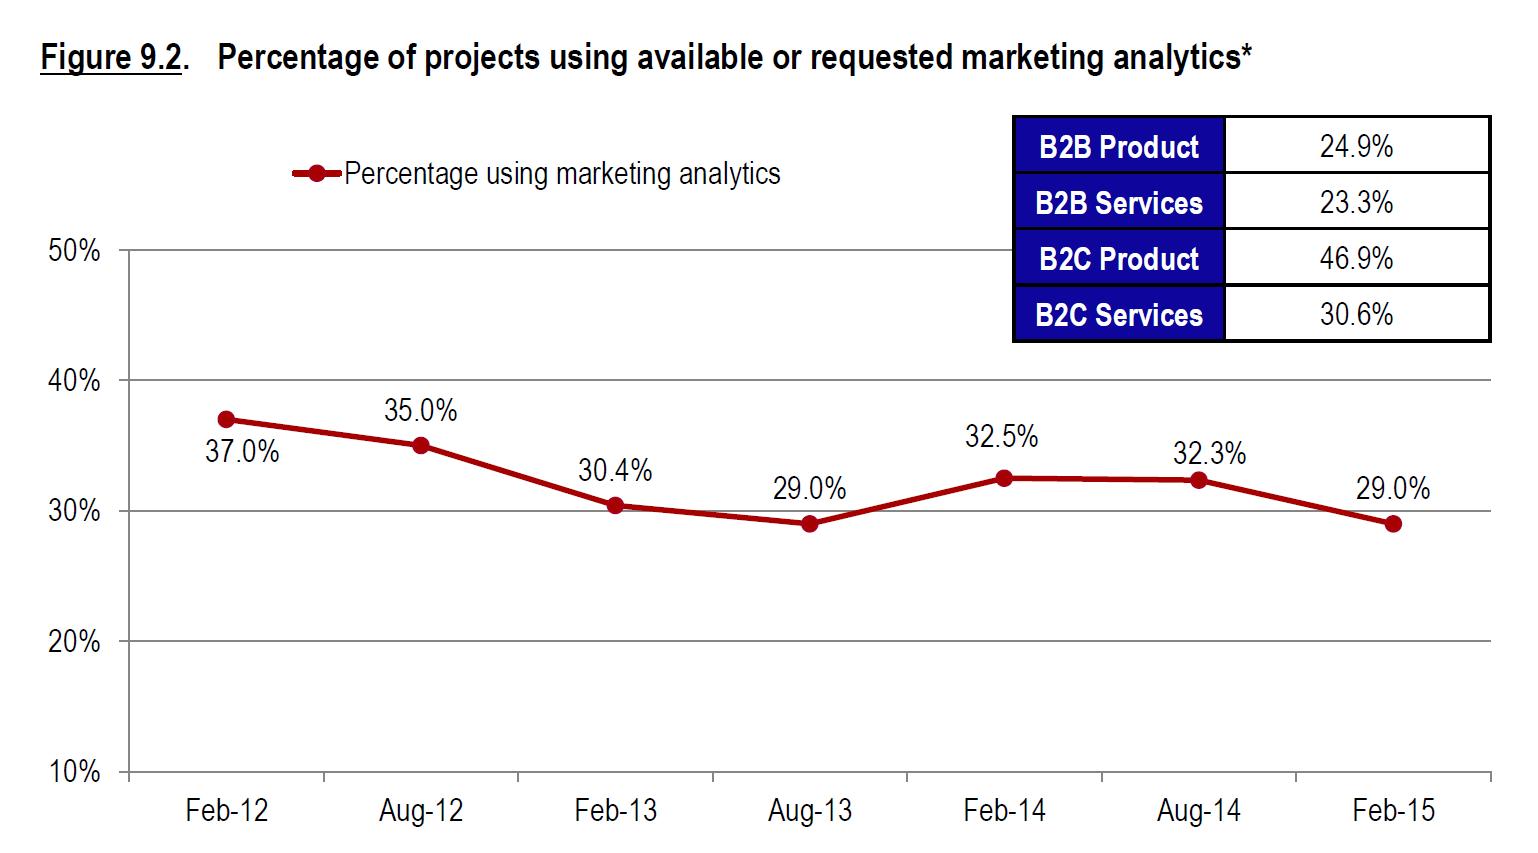 Percentage of projects using marketing analytics